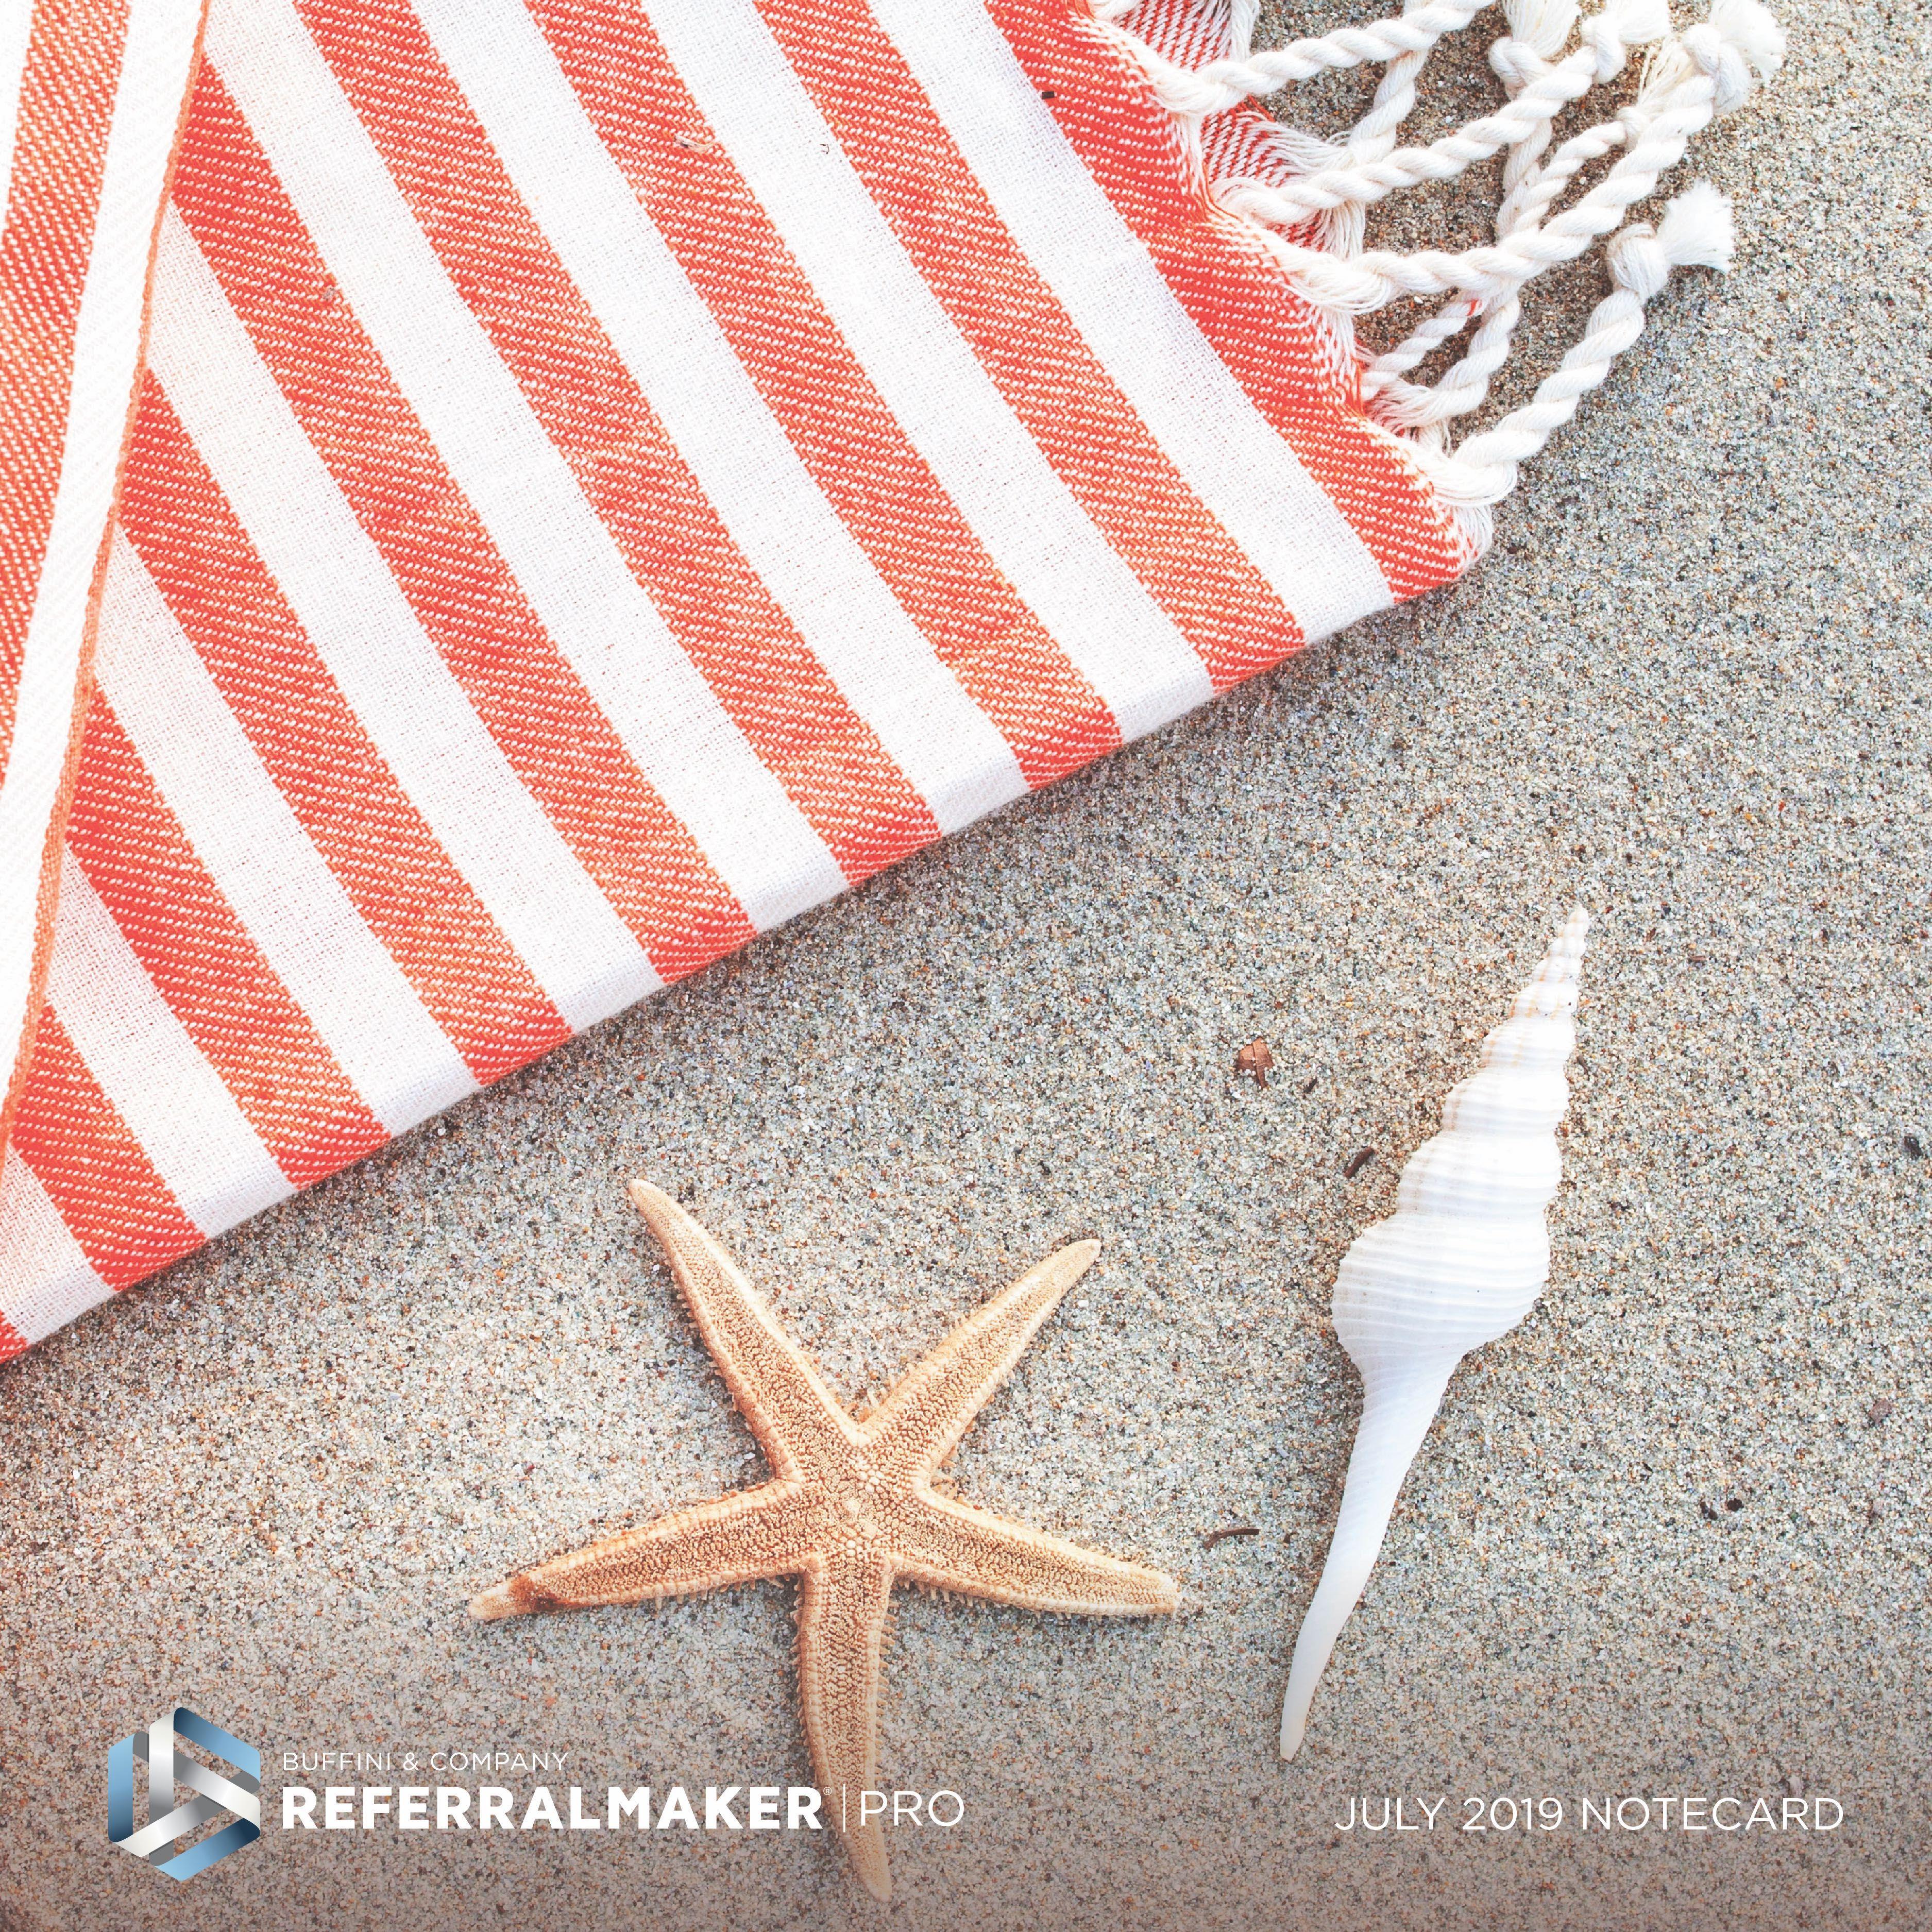 59 Marketing Materials Ideas Marketing Materials Marketing Referrals